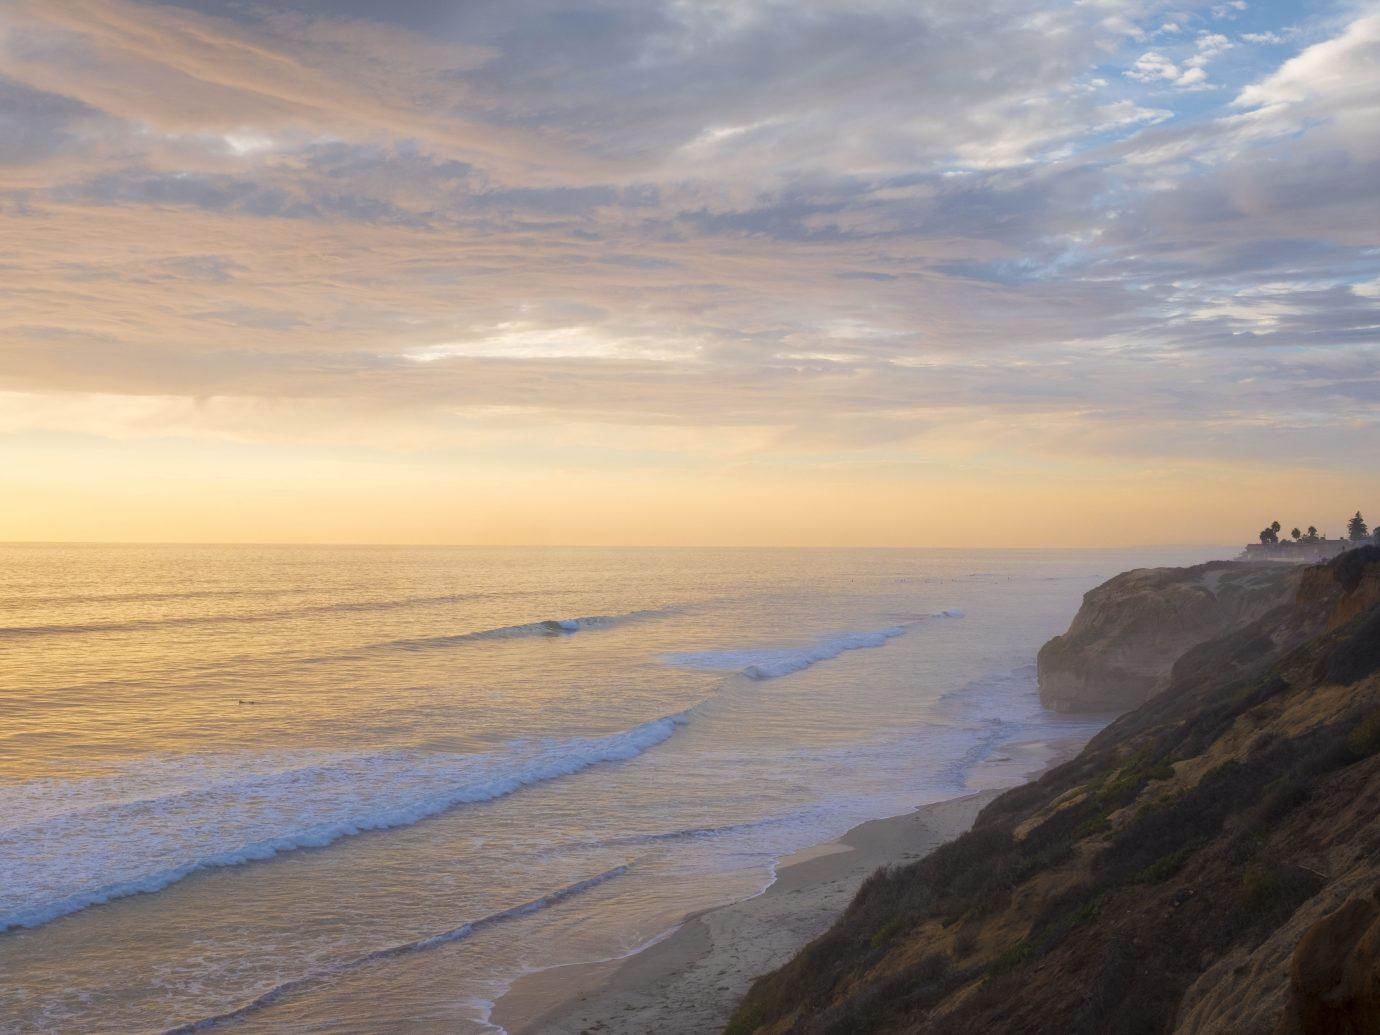 Surfers enjoying waves at sunset at San Diego's North county beaches near Encinitas and Carlsbad California